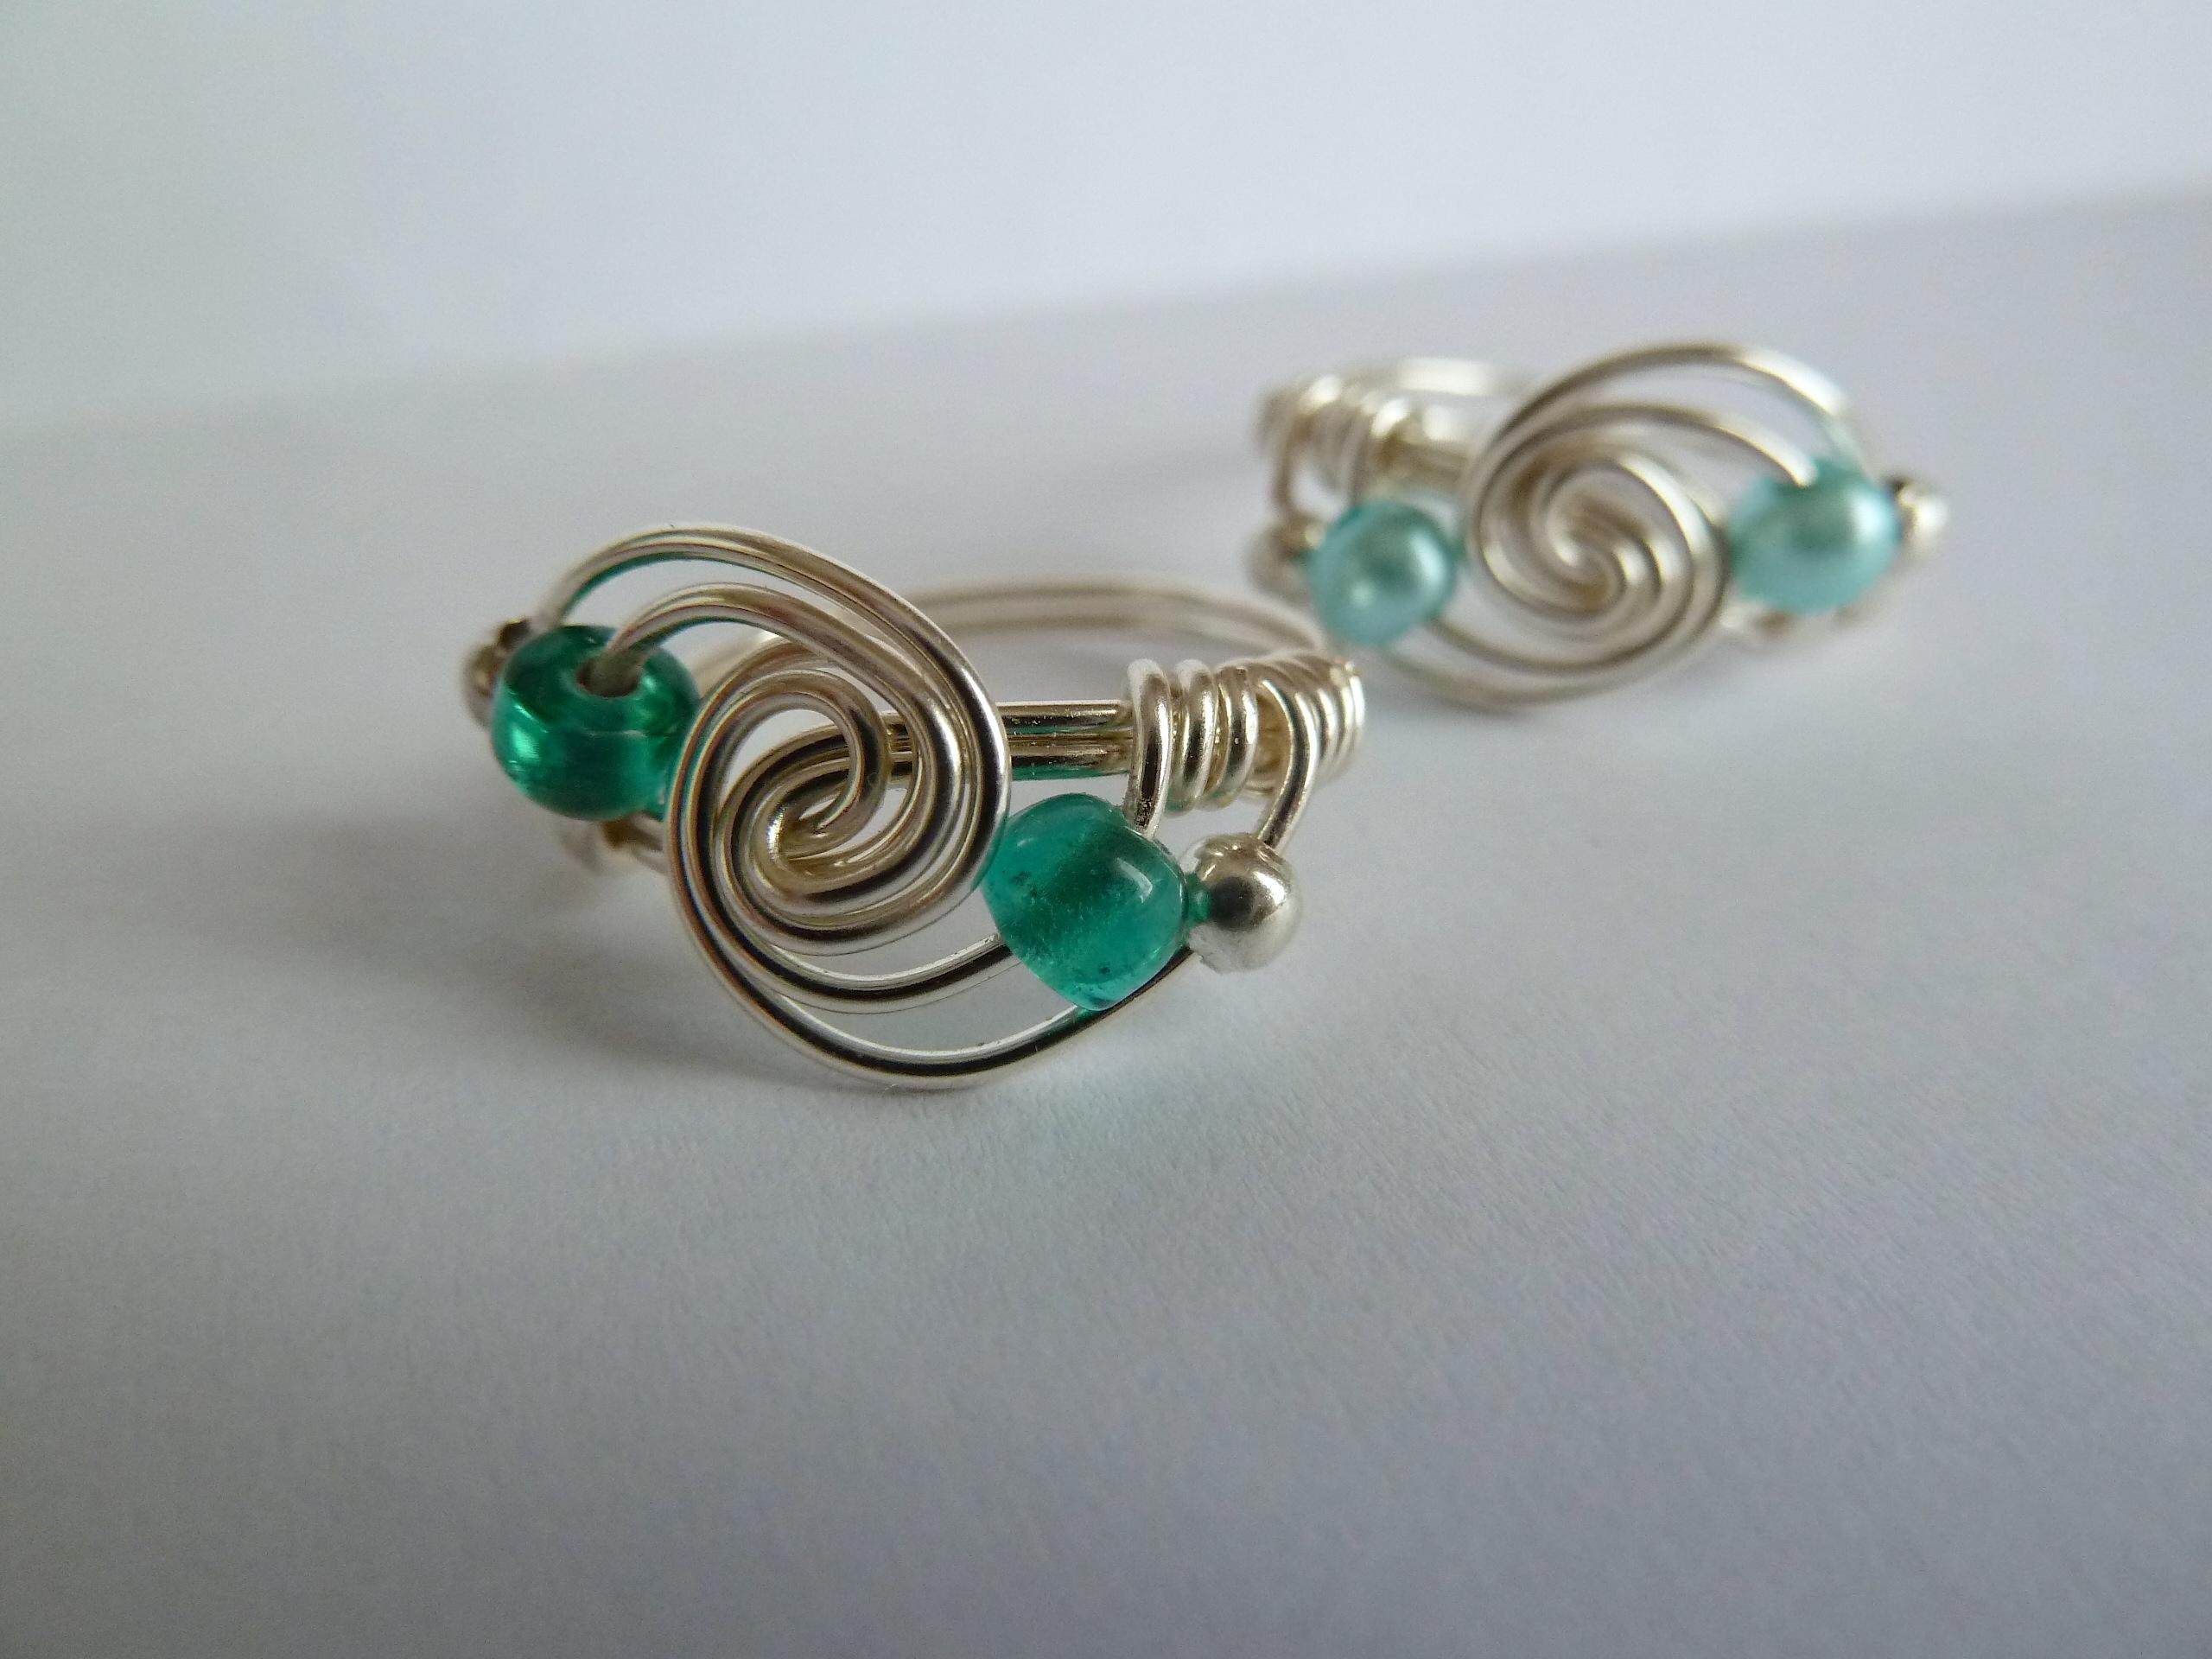 Spiral galaxy rings